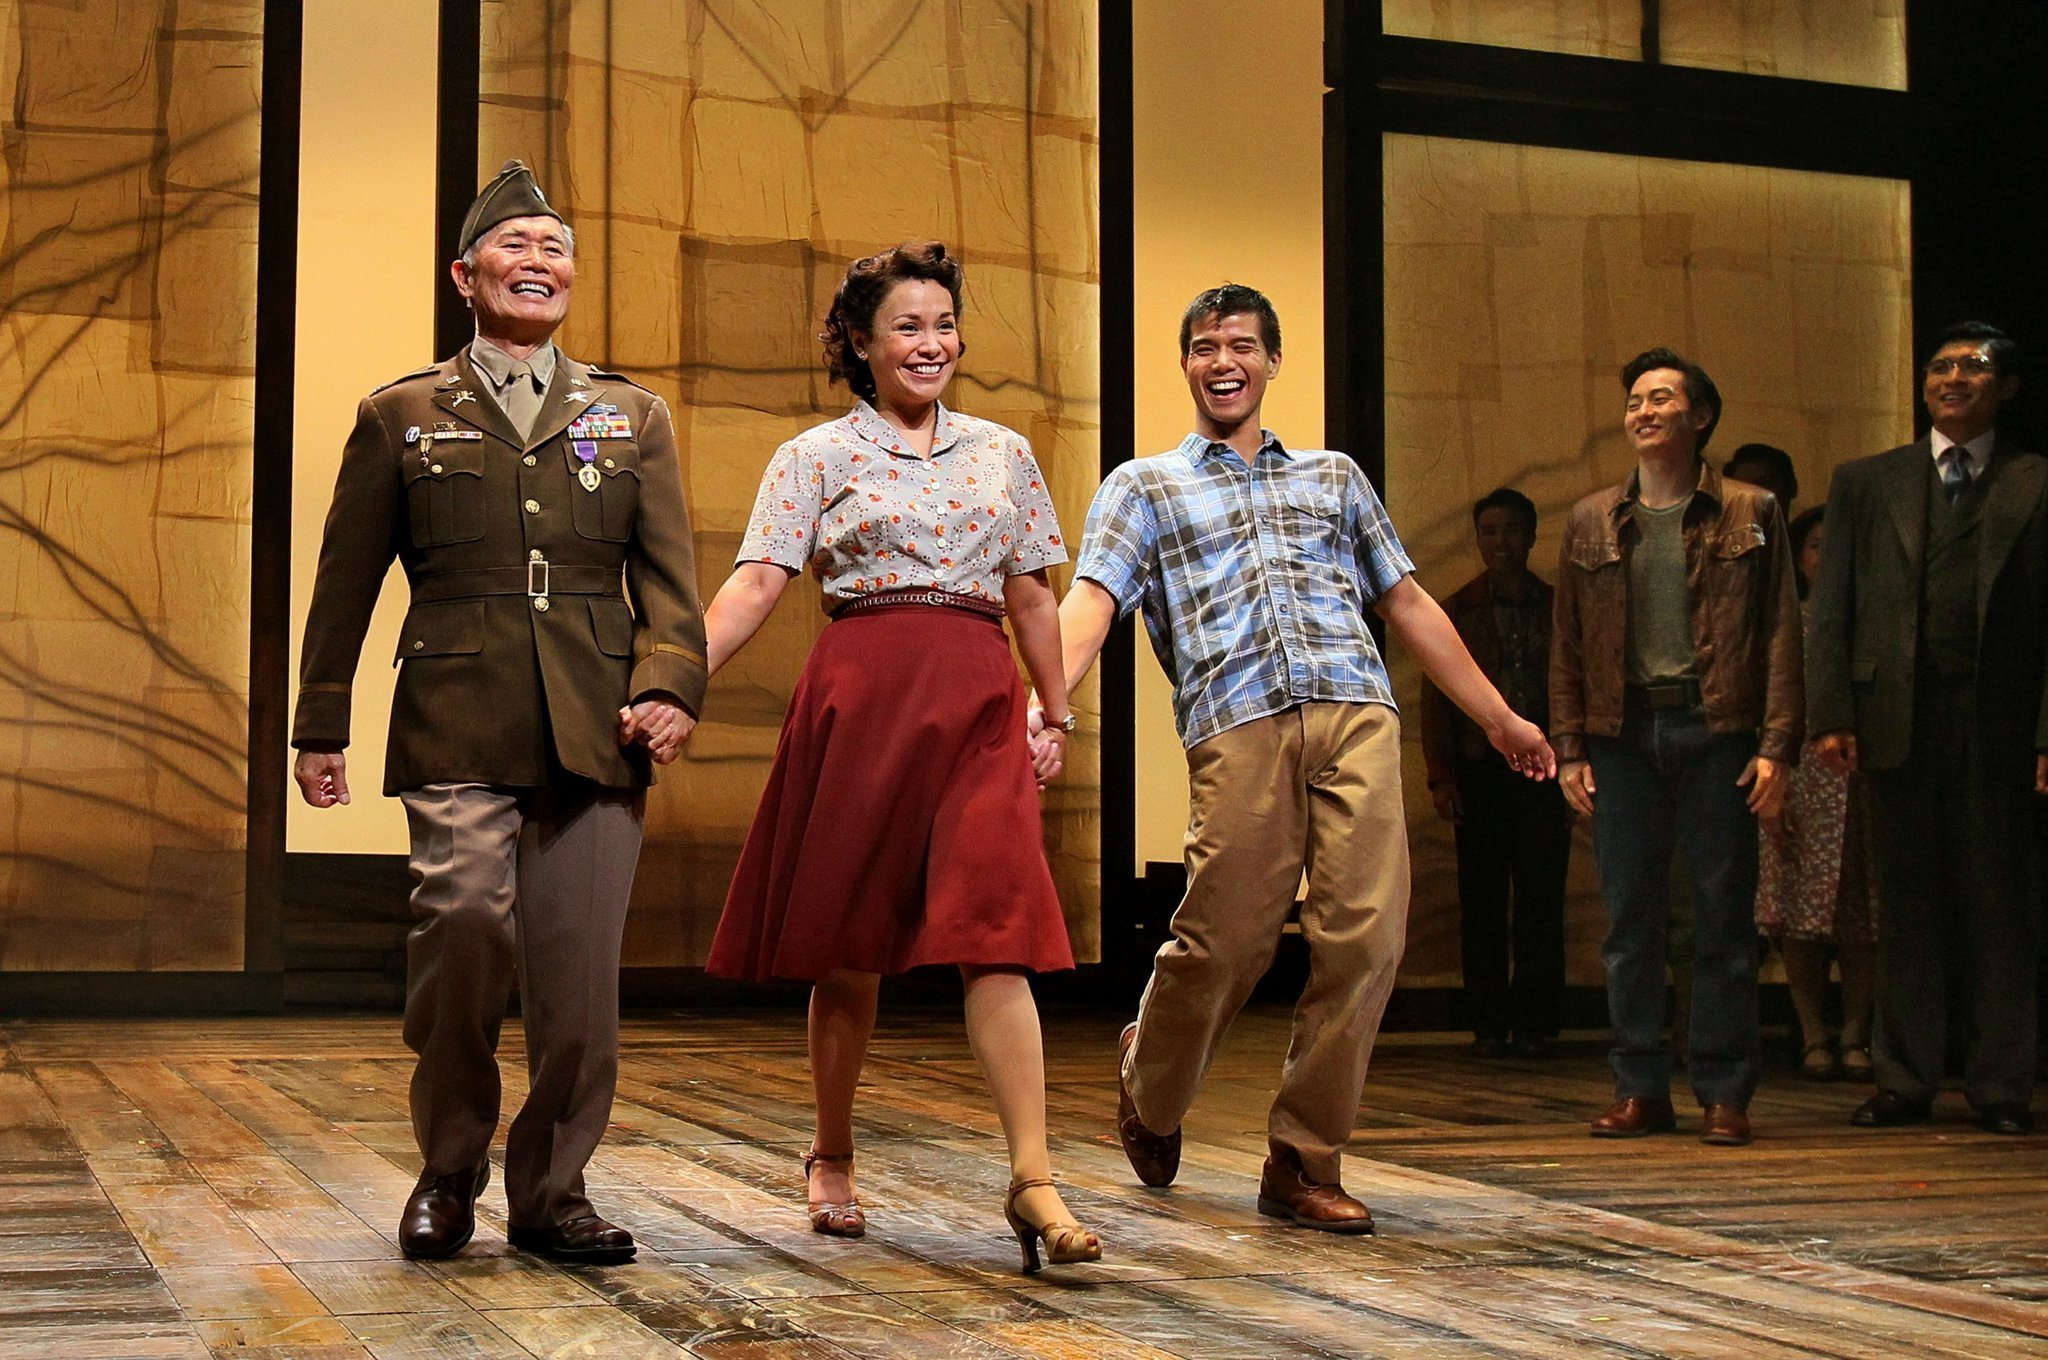 sdut-old-globe-theatre-allegiance-george-takei-broadway-2015oct06